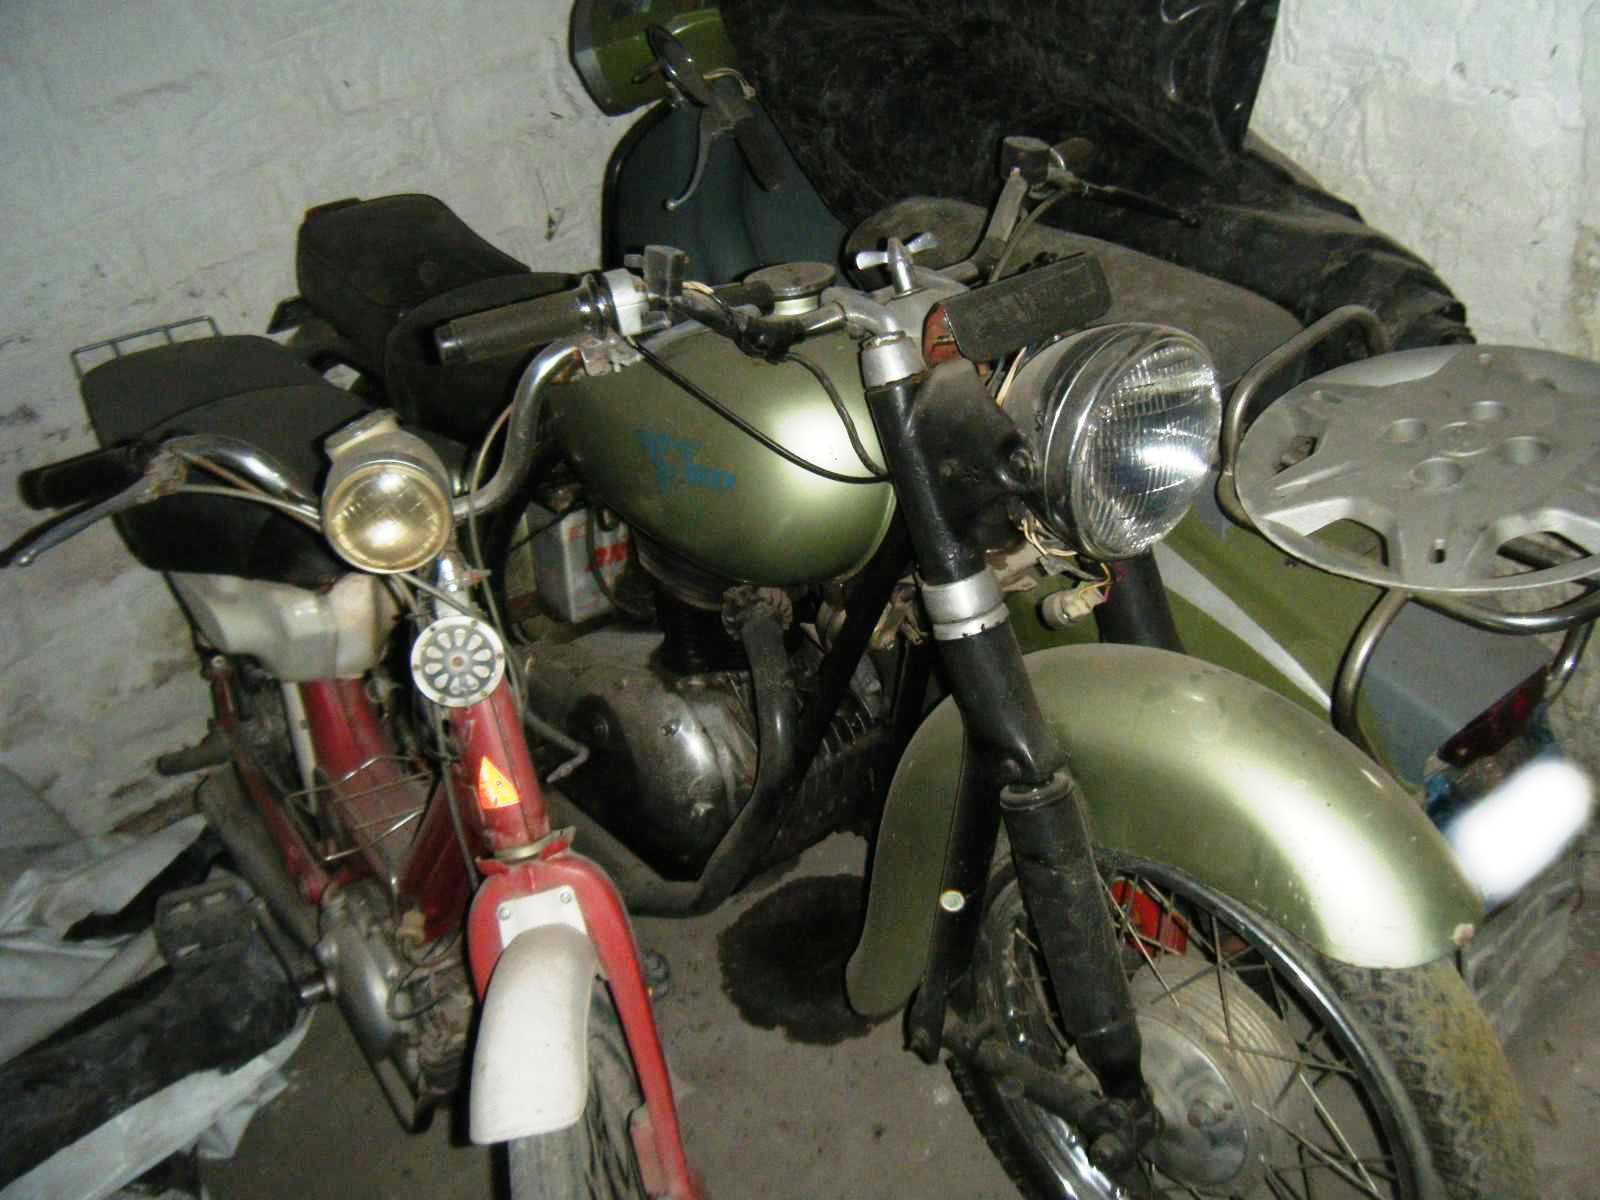 pablo-moto-horex-350cc-ano-1948-1 Moto Horex 350cc (ano 1948)